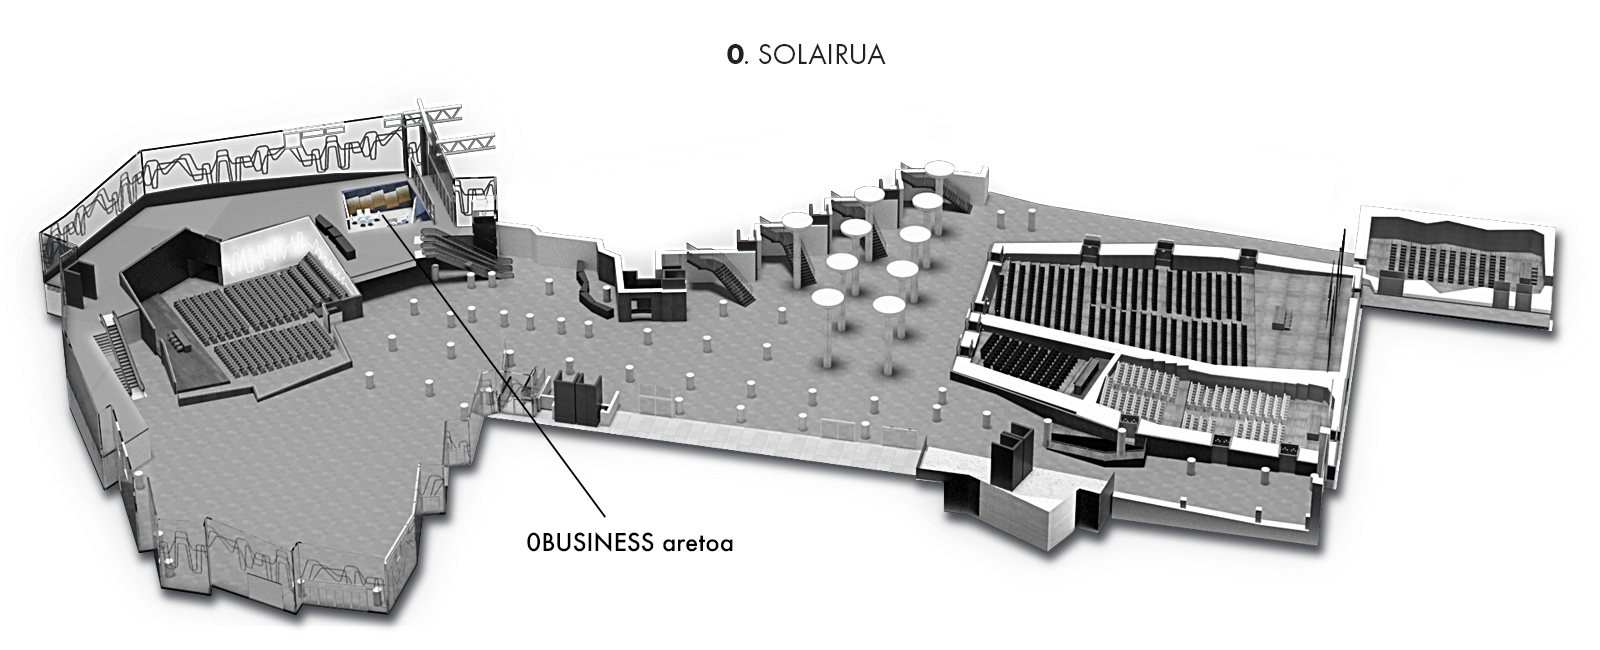 0BUSINESS aretoa, 0. solairua   Palacio Euskalduna Jauregia